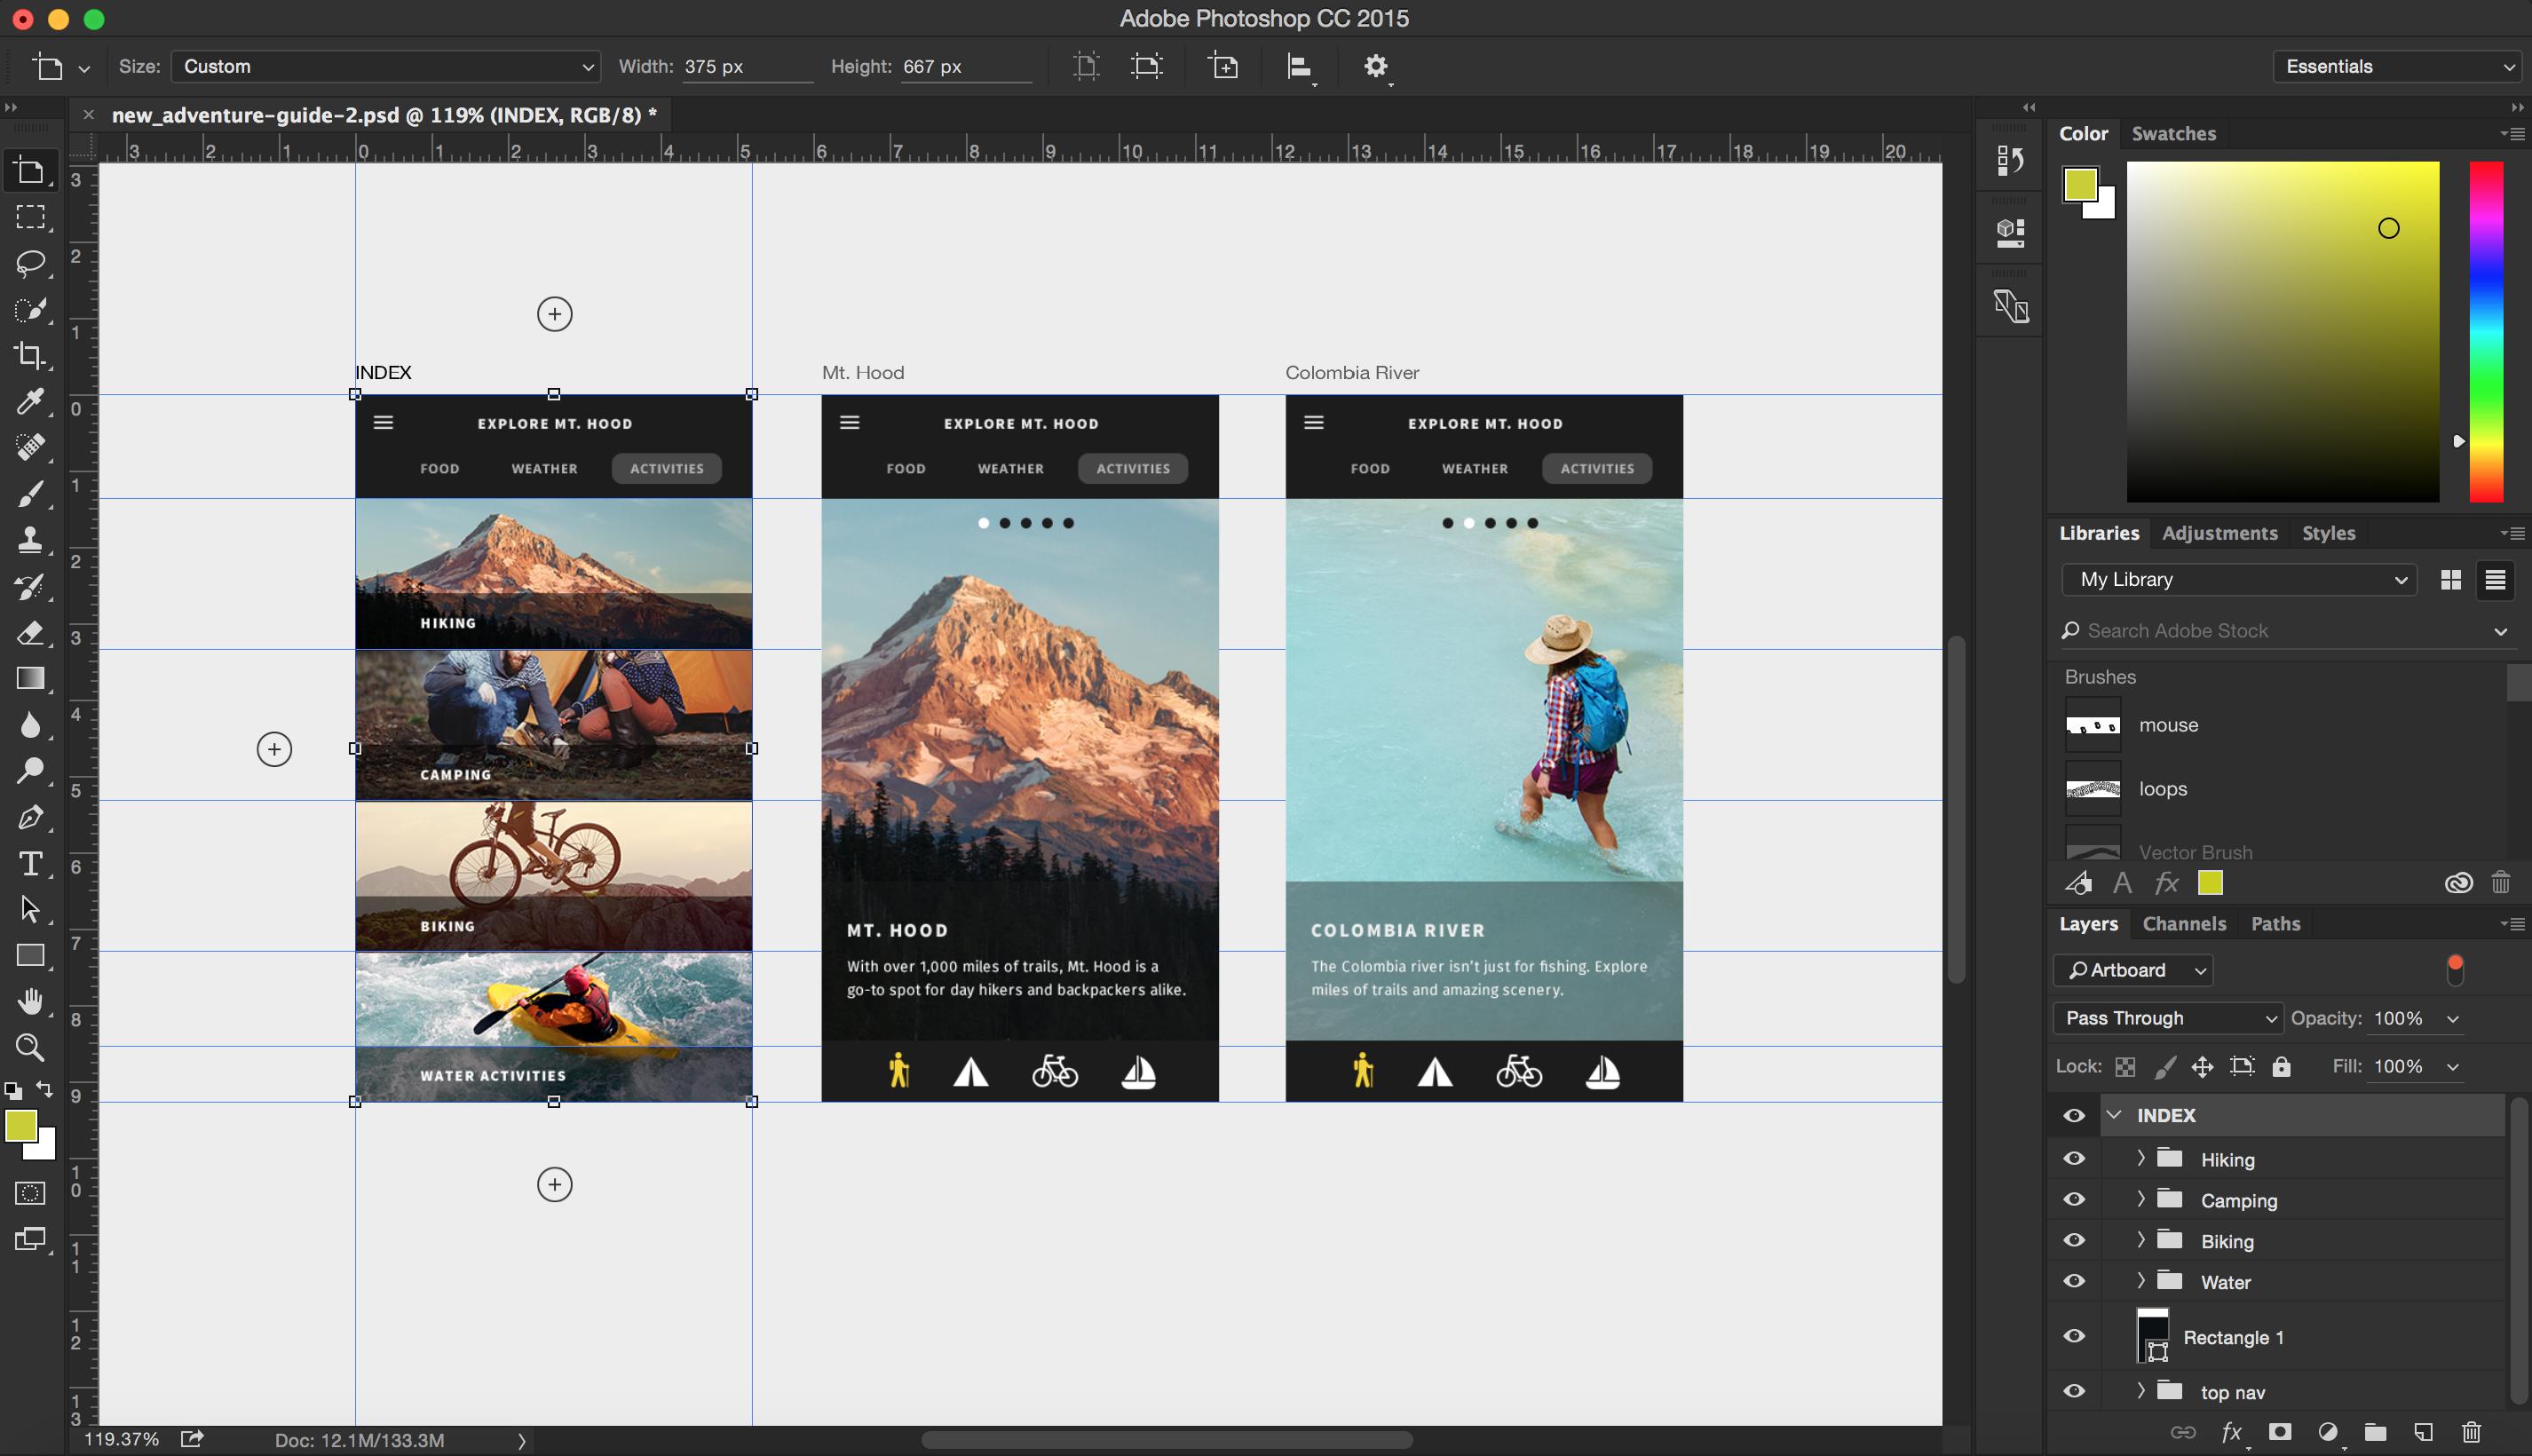 Adobe photoshop и дизайн